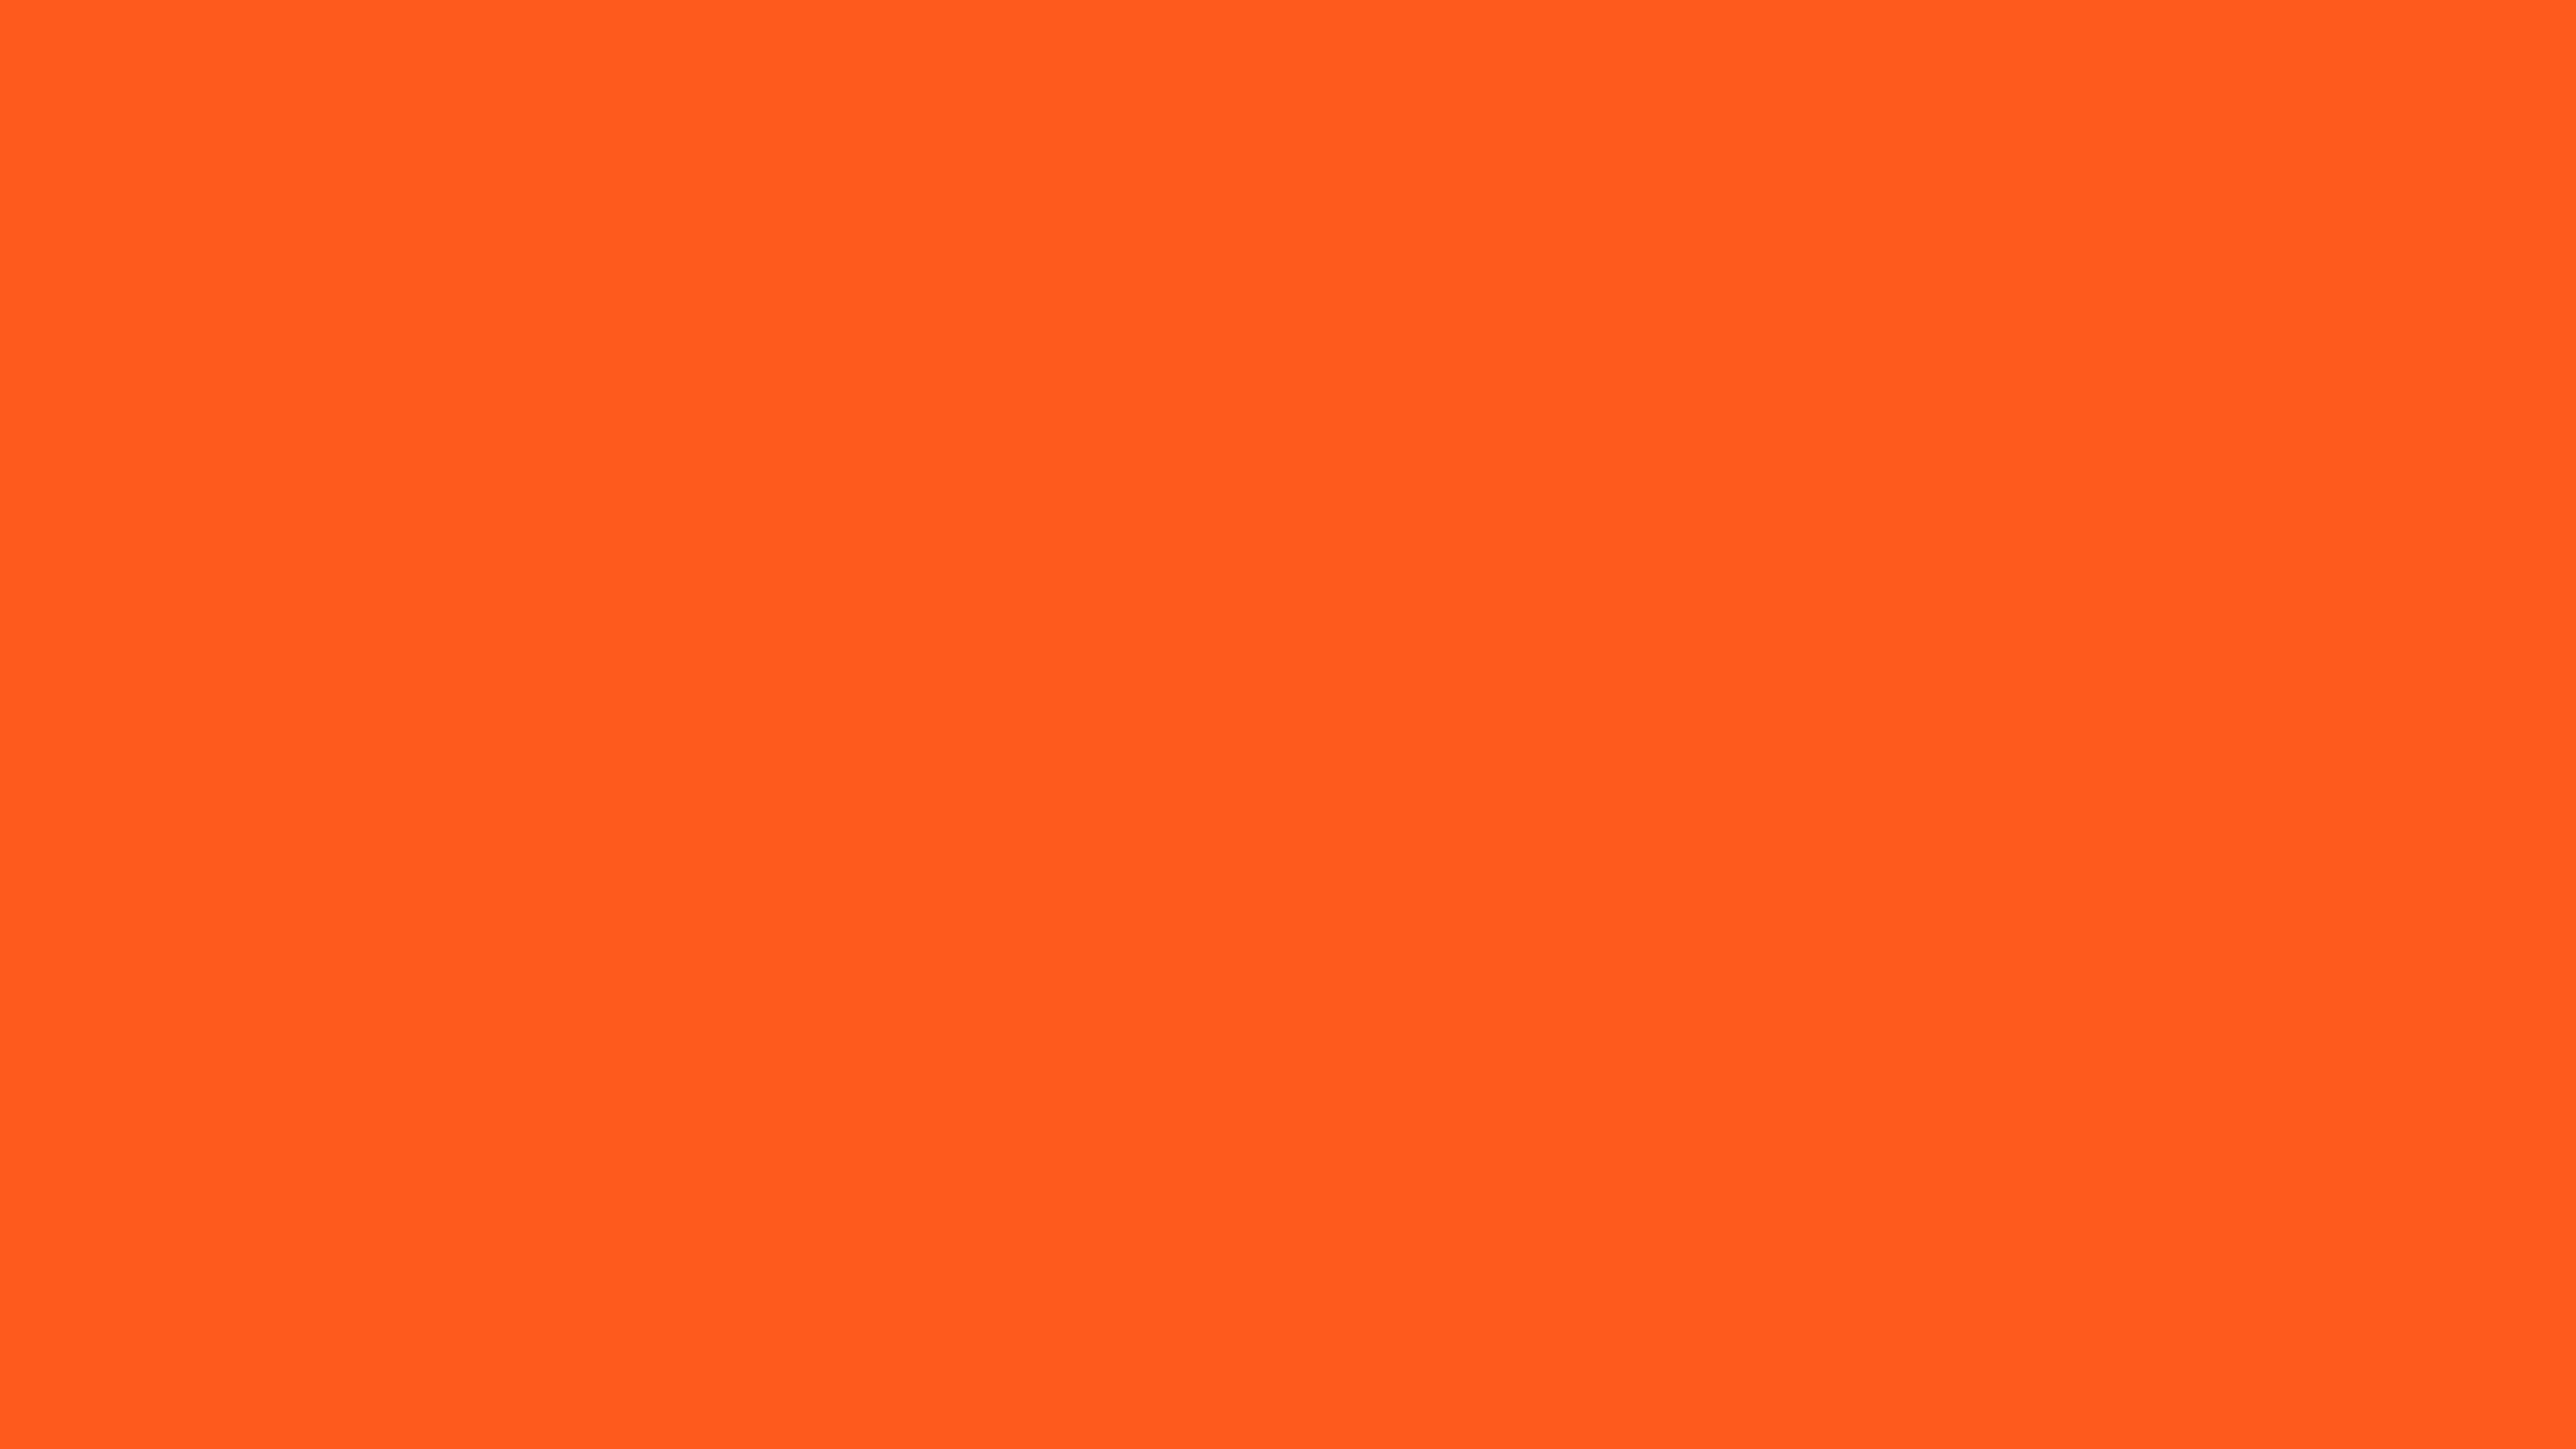 4096x2304 Giants Orange Solid Color Background